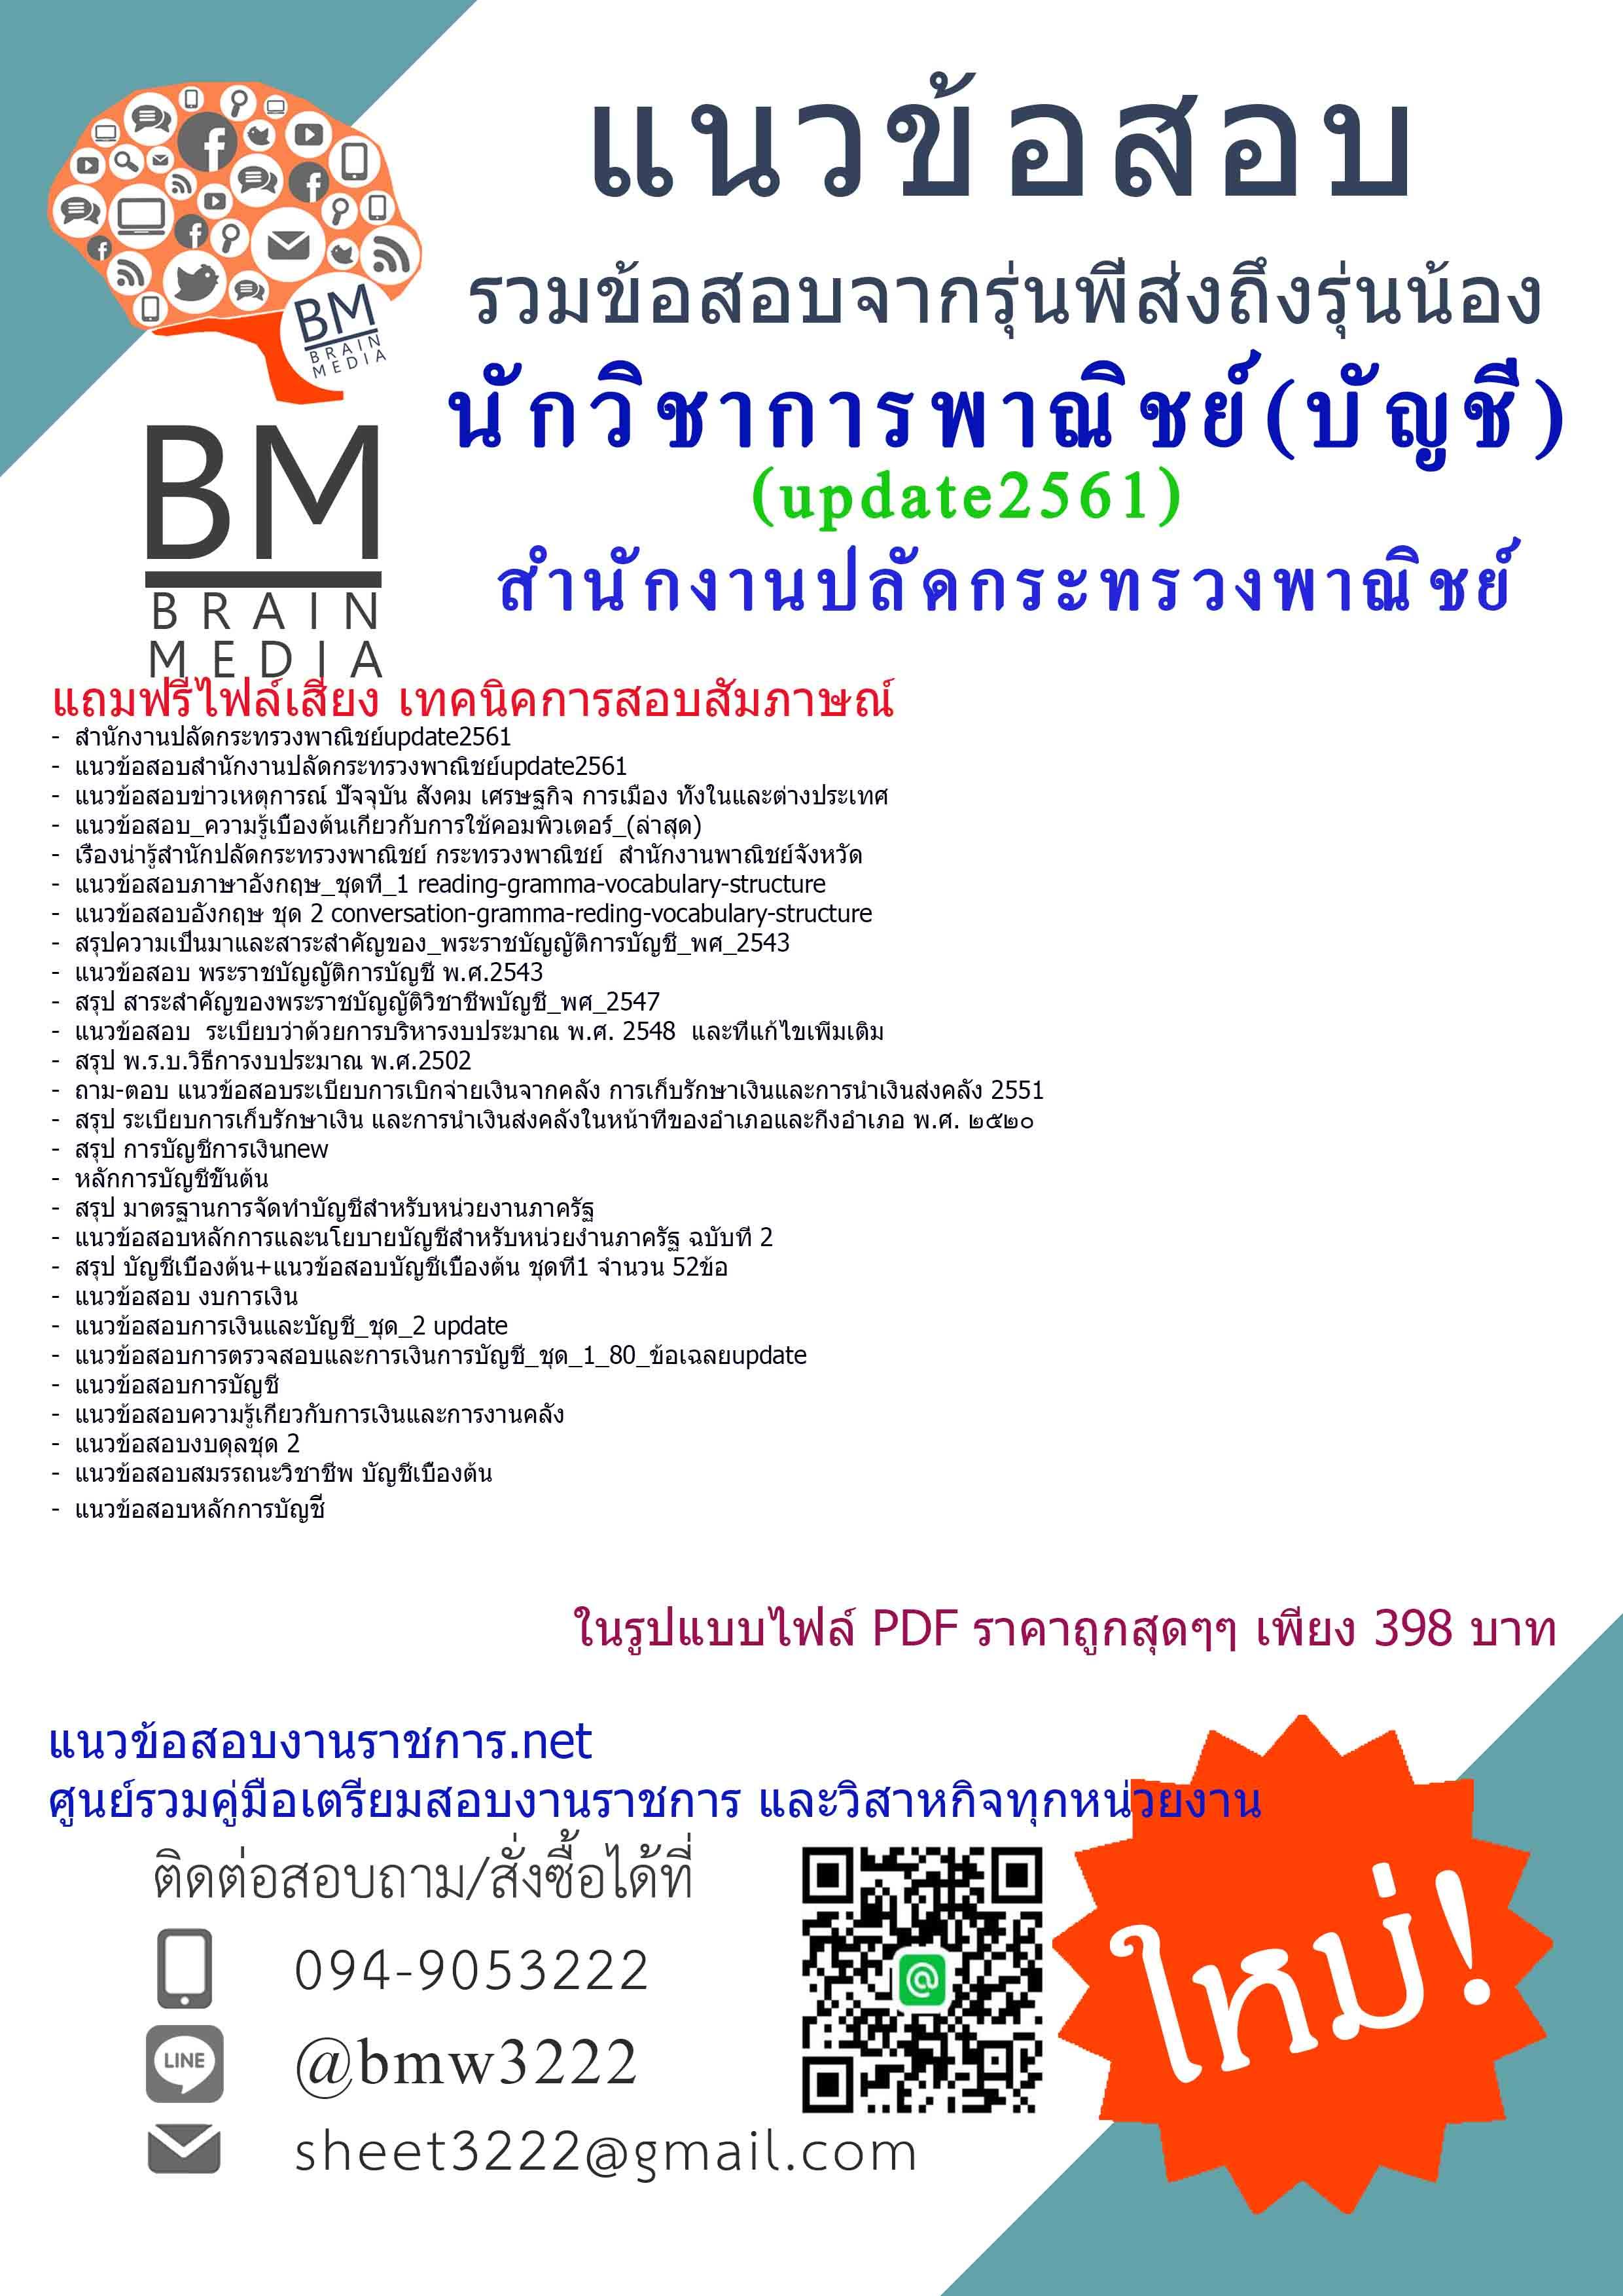 (((updateสุดๆ)))แนวข้อสอบนักวิชาการพาณิชย์(บัญชี)สำนักงานปลัดกระทรวงพาณิชย์2561